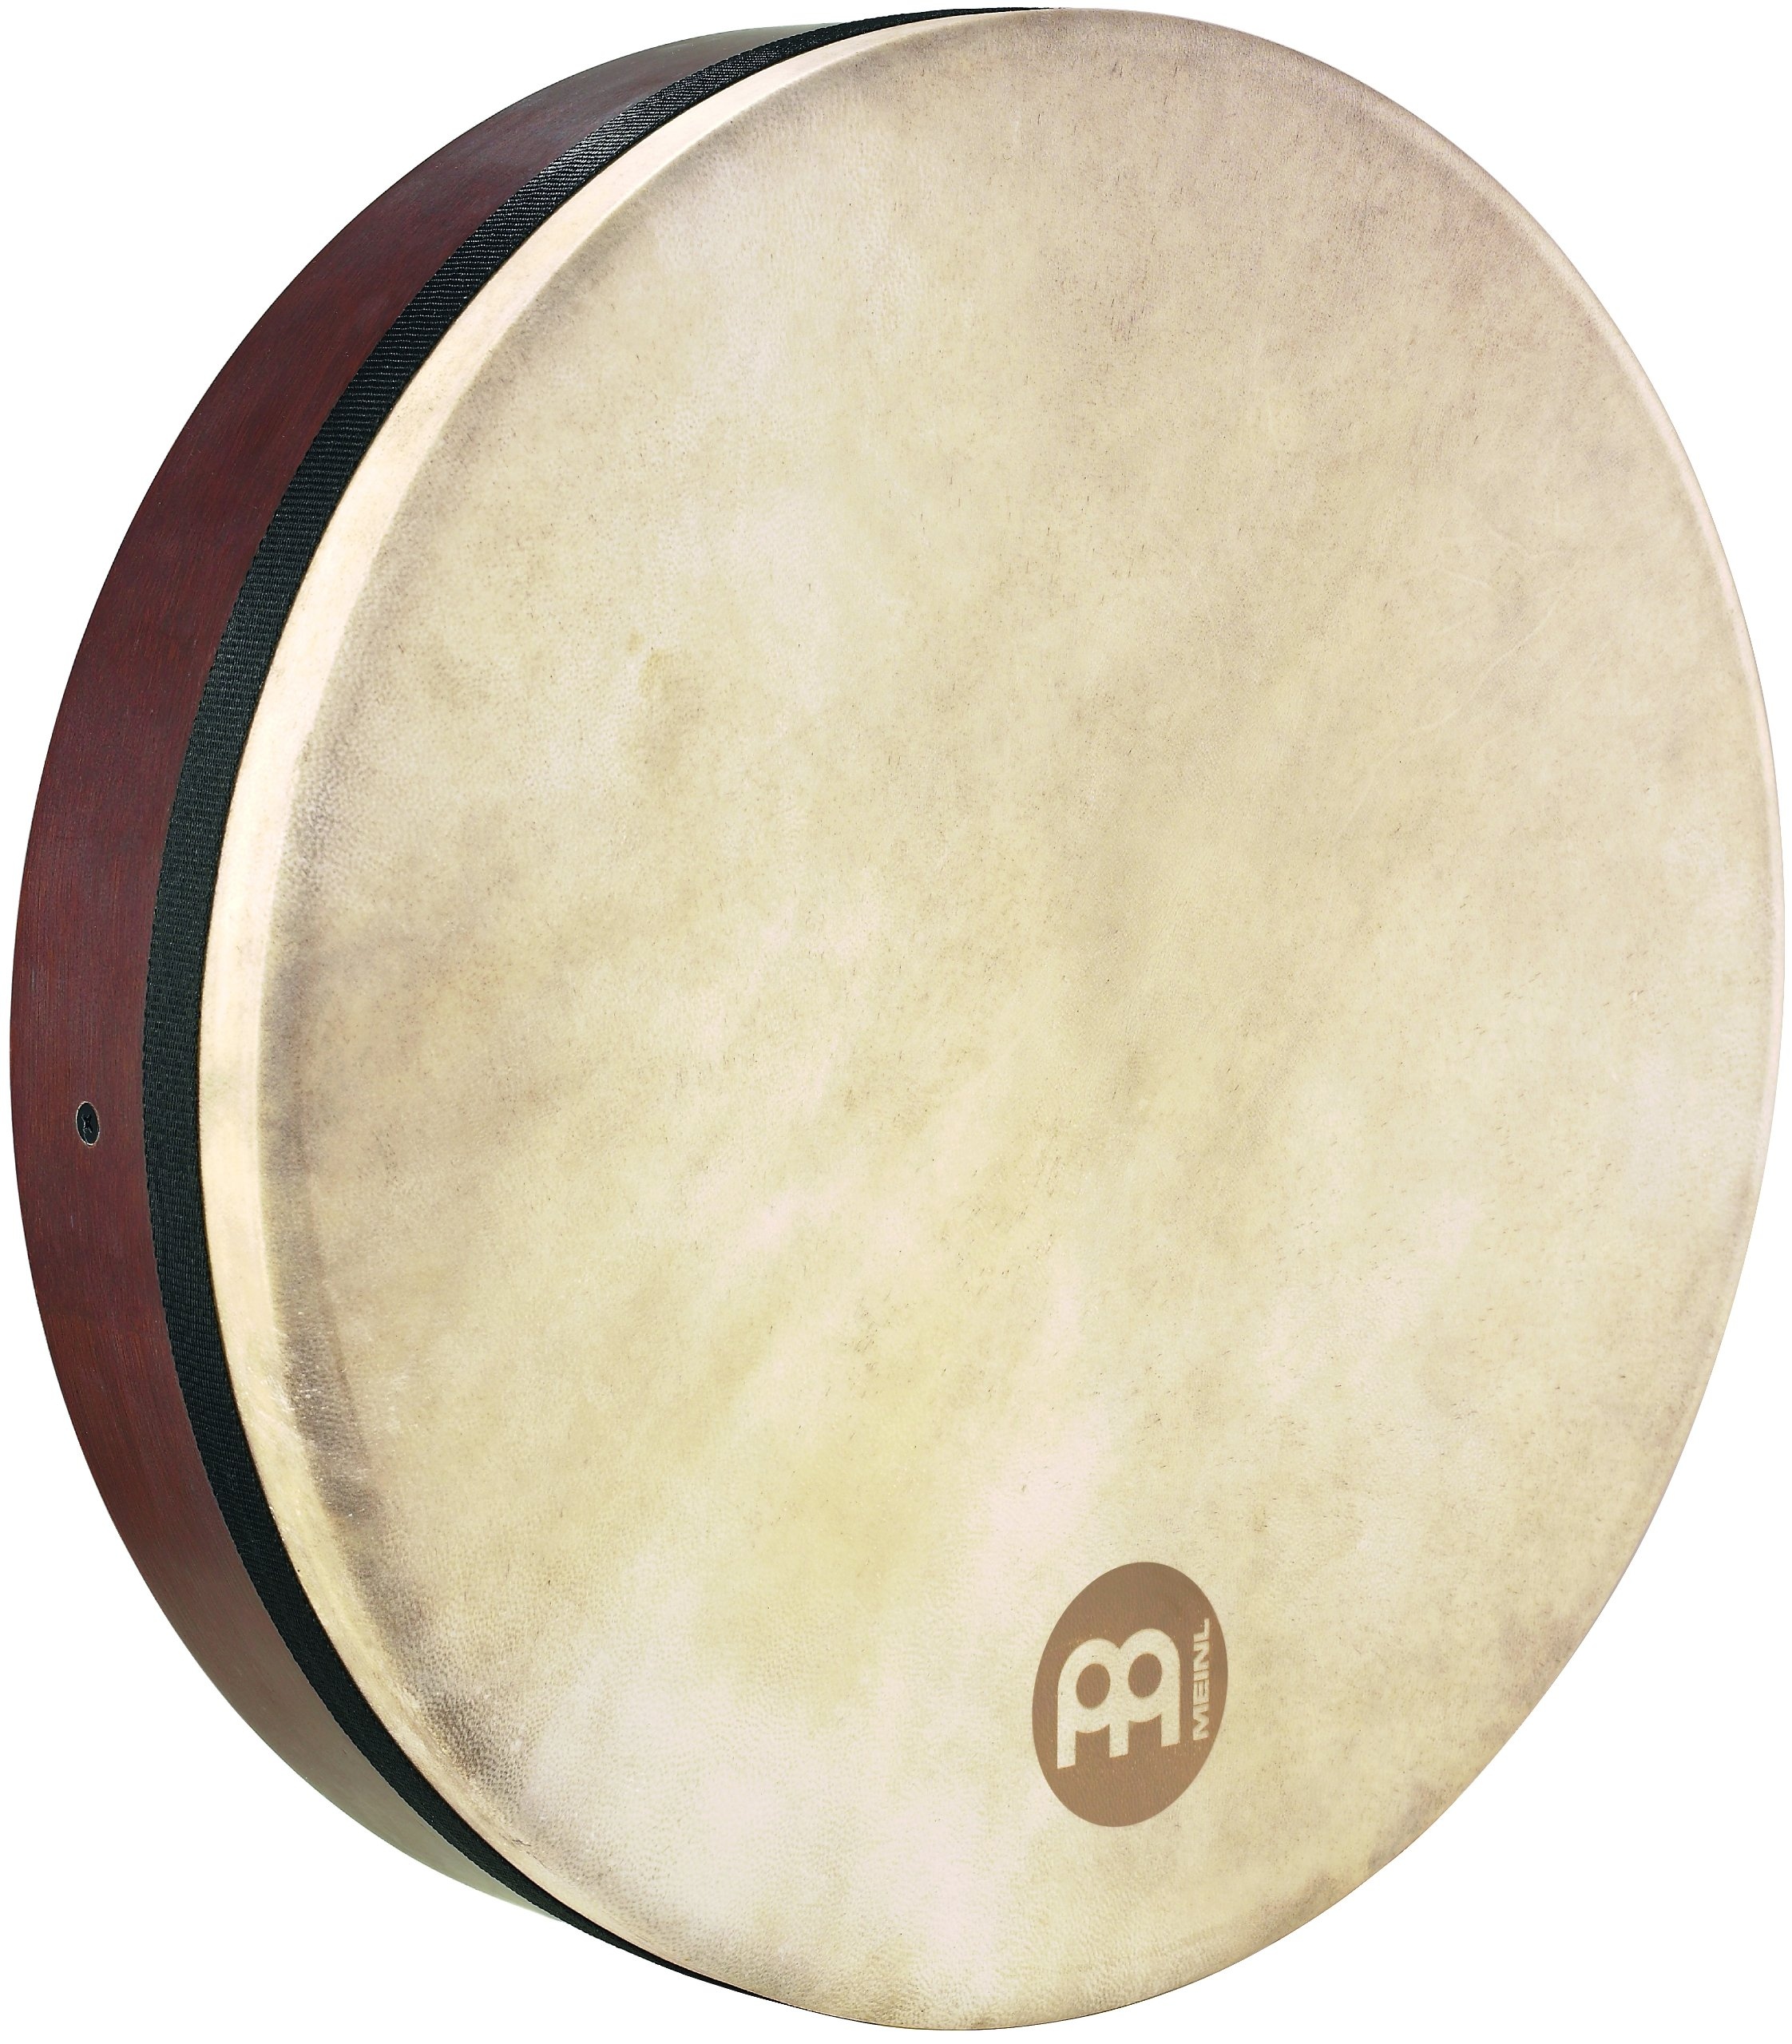 Meinl Percussion FD18BO 18-Inch Bodhran With Goat Skin Head, African Brown